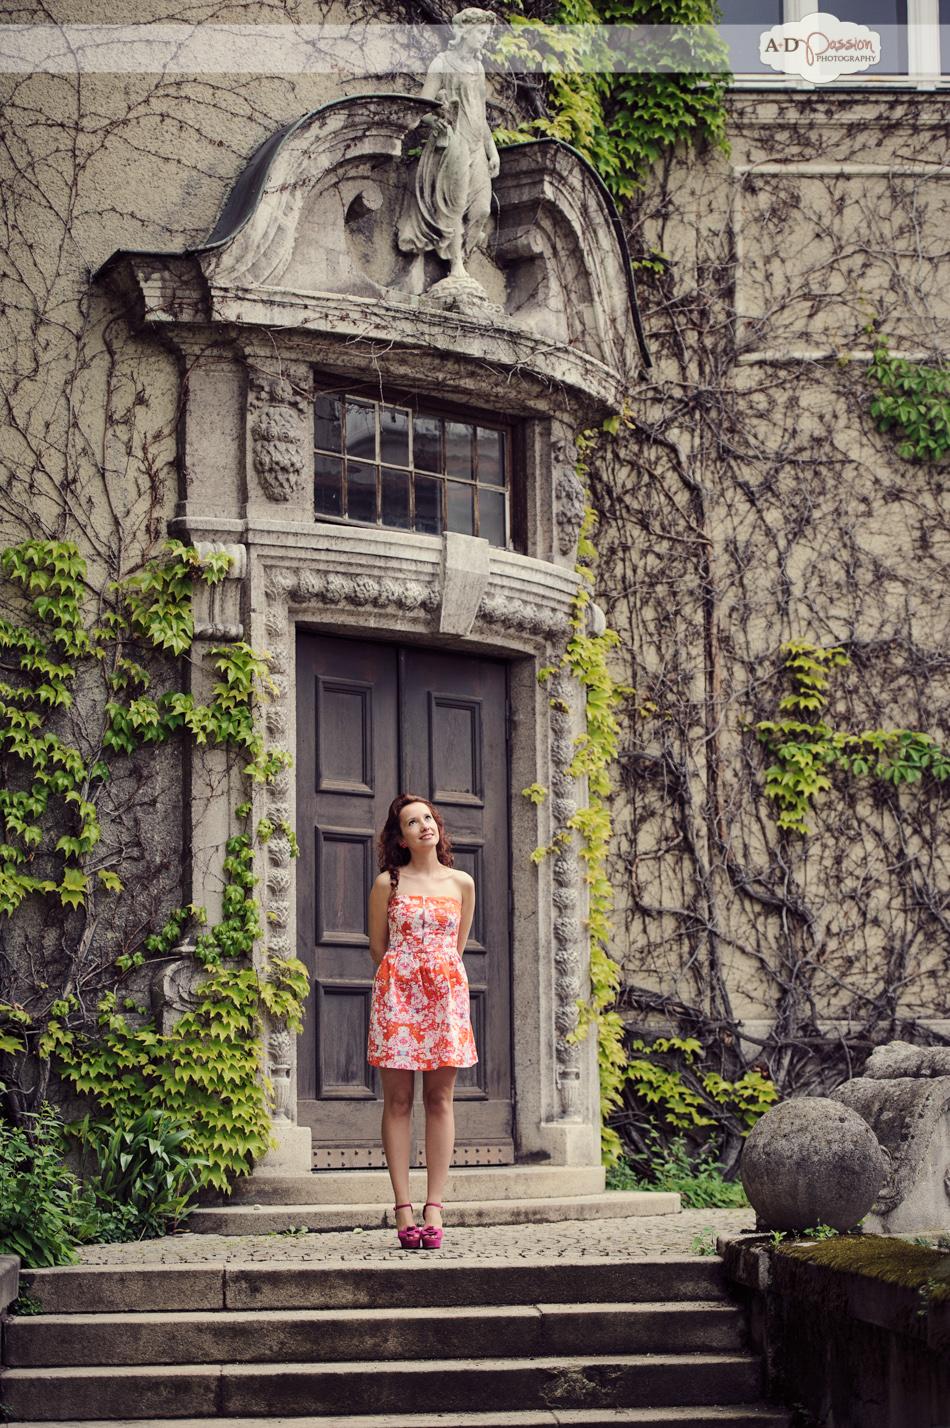 AD Passion Photography | fotograf-nunta_sedinta-foto-munchen_walter-si-cristina_0026 | Adelin, Dida, fotograf profesionist, fotograf de nunta, fotografie de nunta, fotograf Timisoara, fotograf Craiova, fotograf Bucuresti, fotograf Arad, nunta Timisoara, nunta Arad, nunta Bucuresti, nunta Craiova